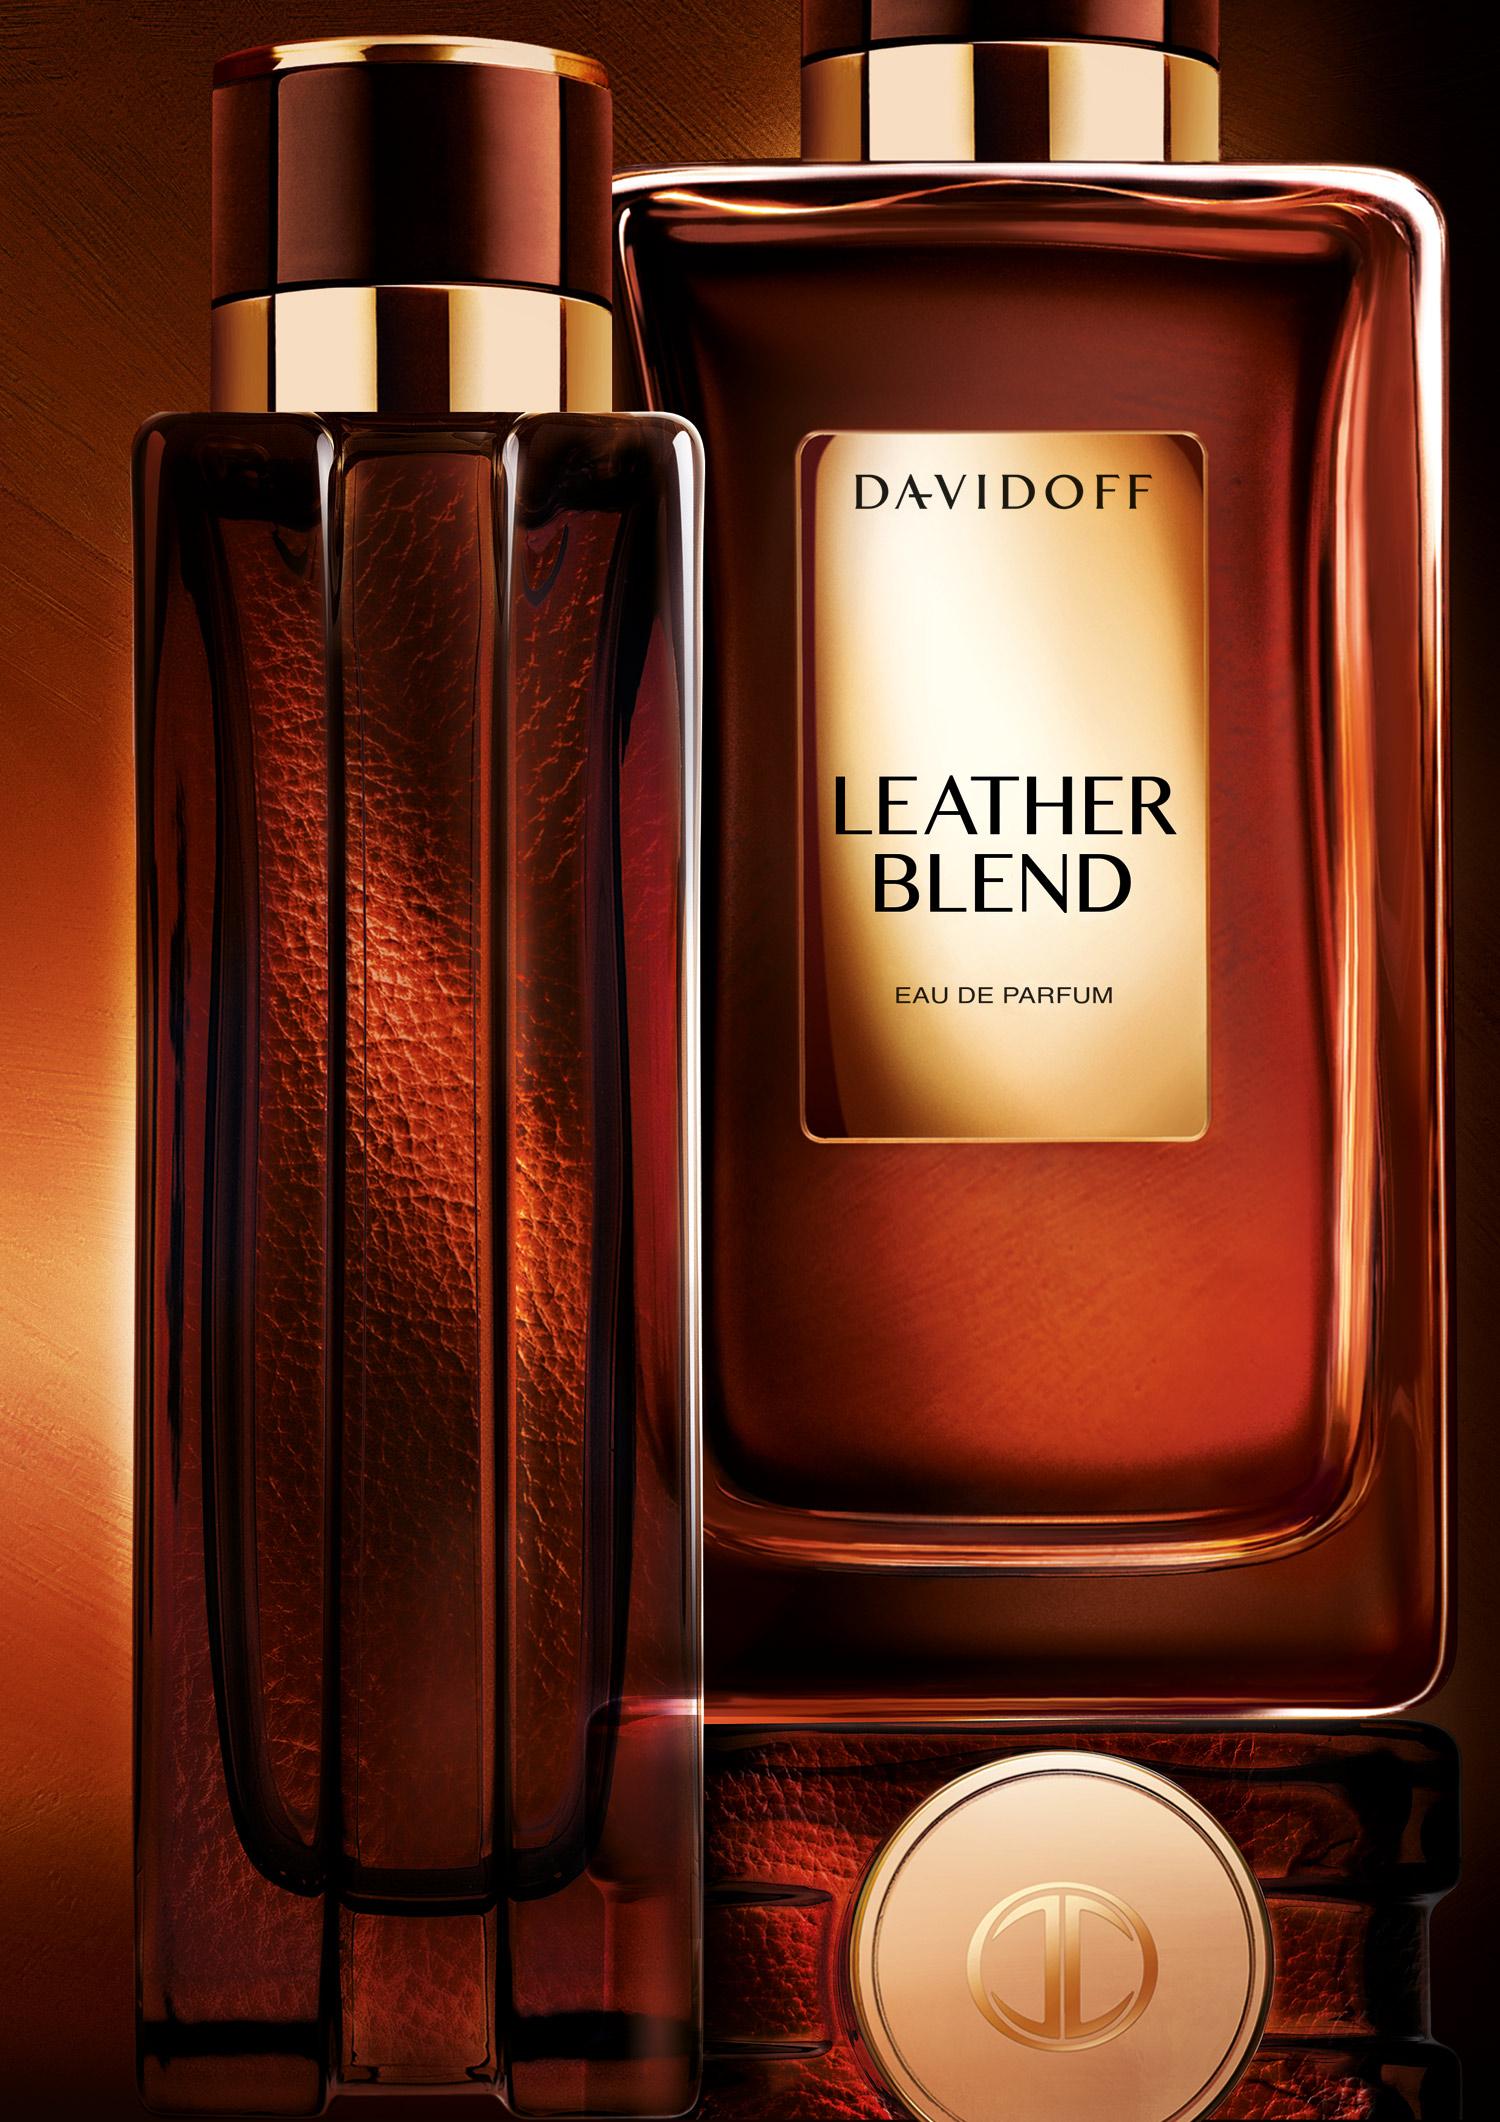 Davidoff Leather Blend Davidoff аромат аромат для мужчин и женщин 2014